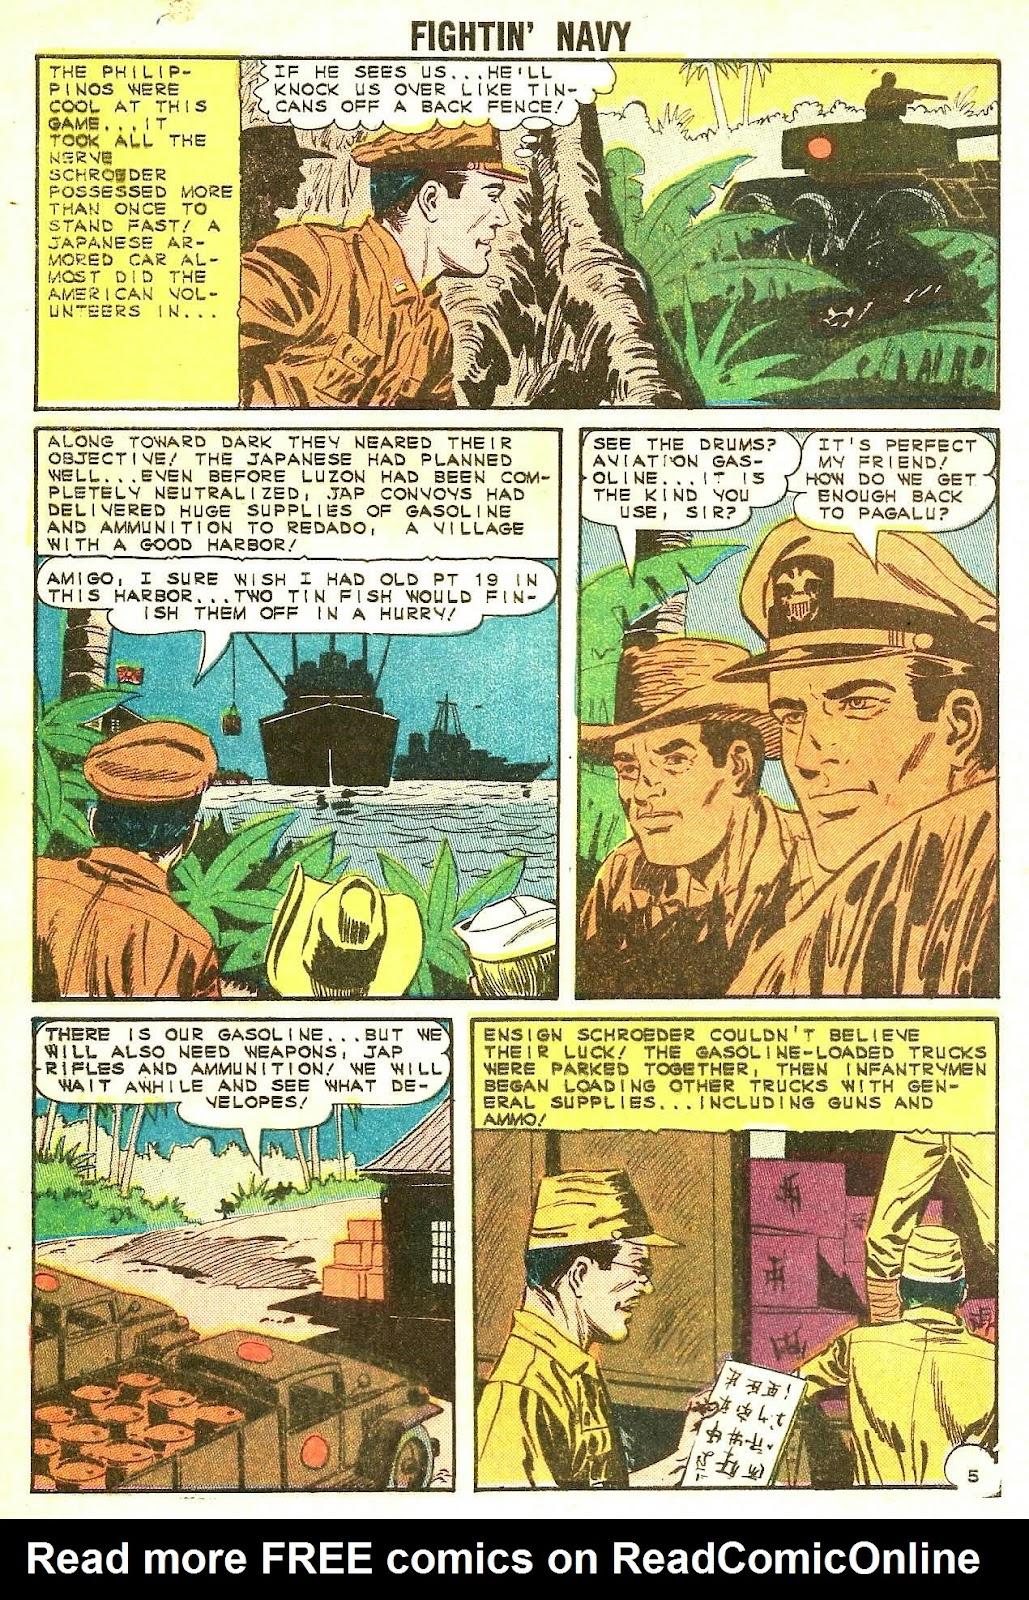 Read online Fightin' Navy comic -  Issue #117 - 8